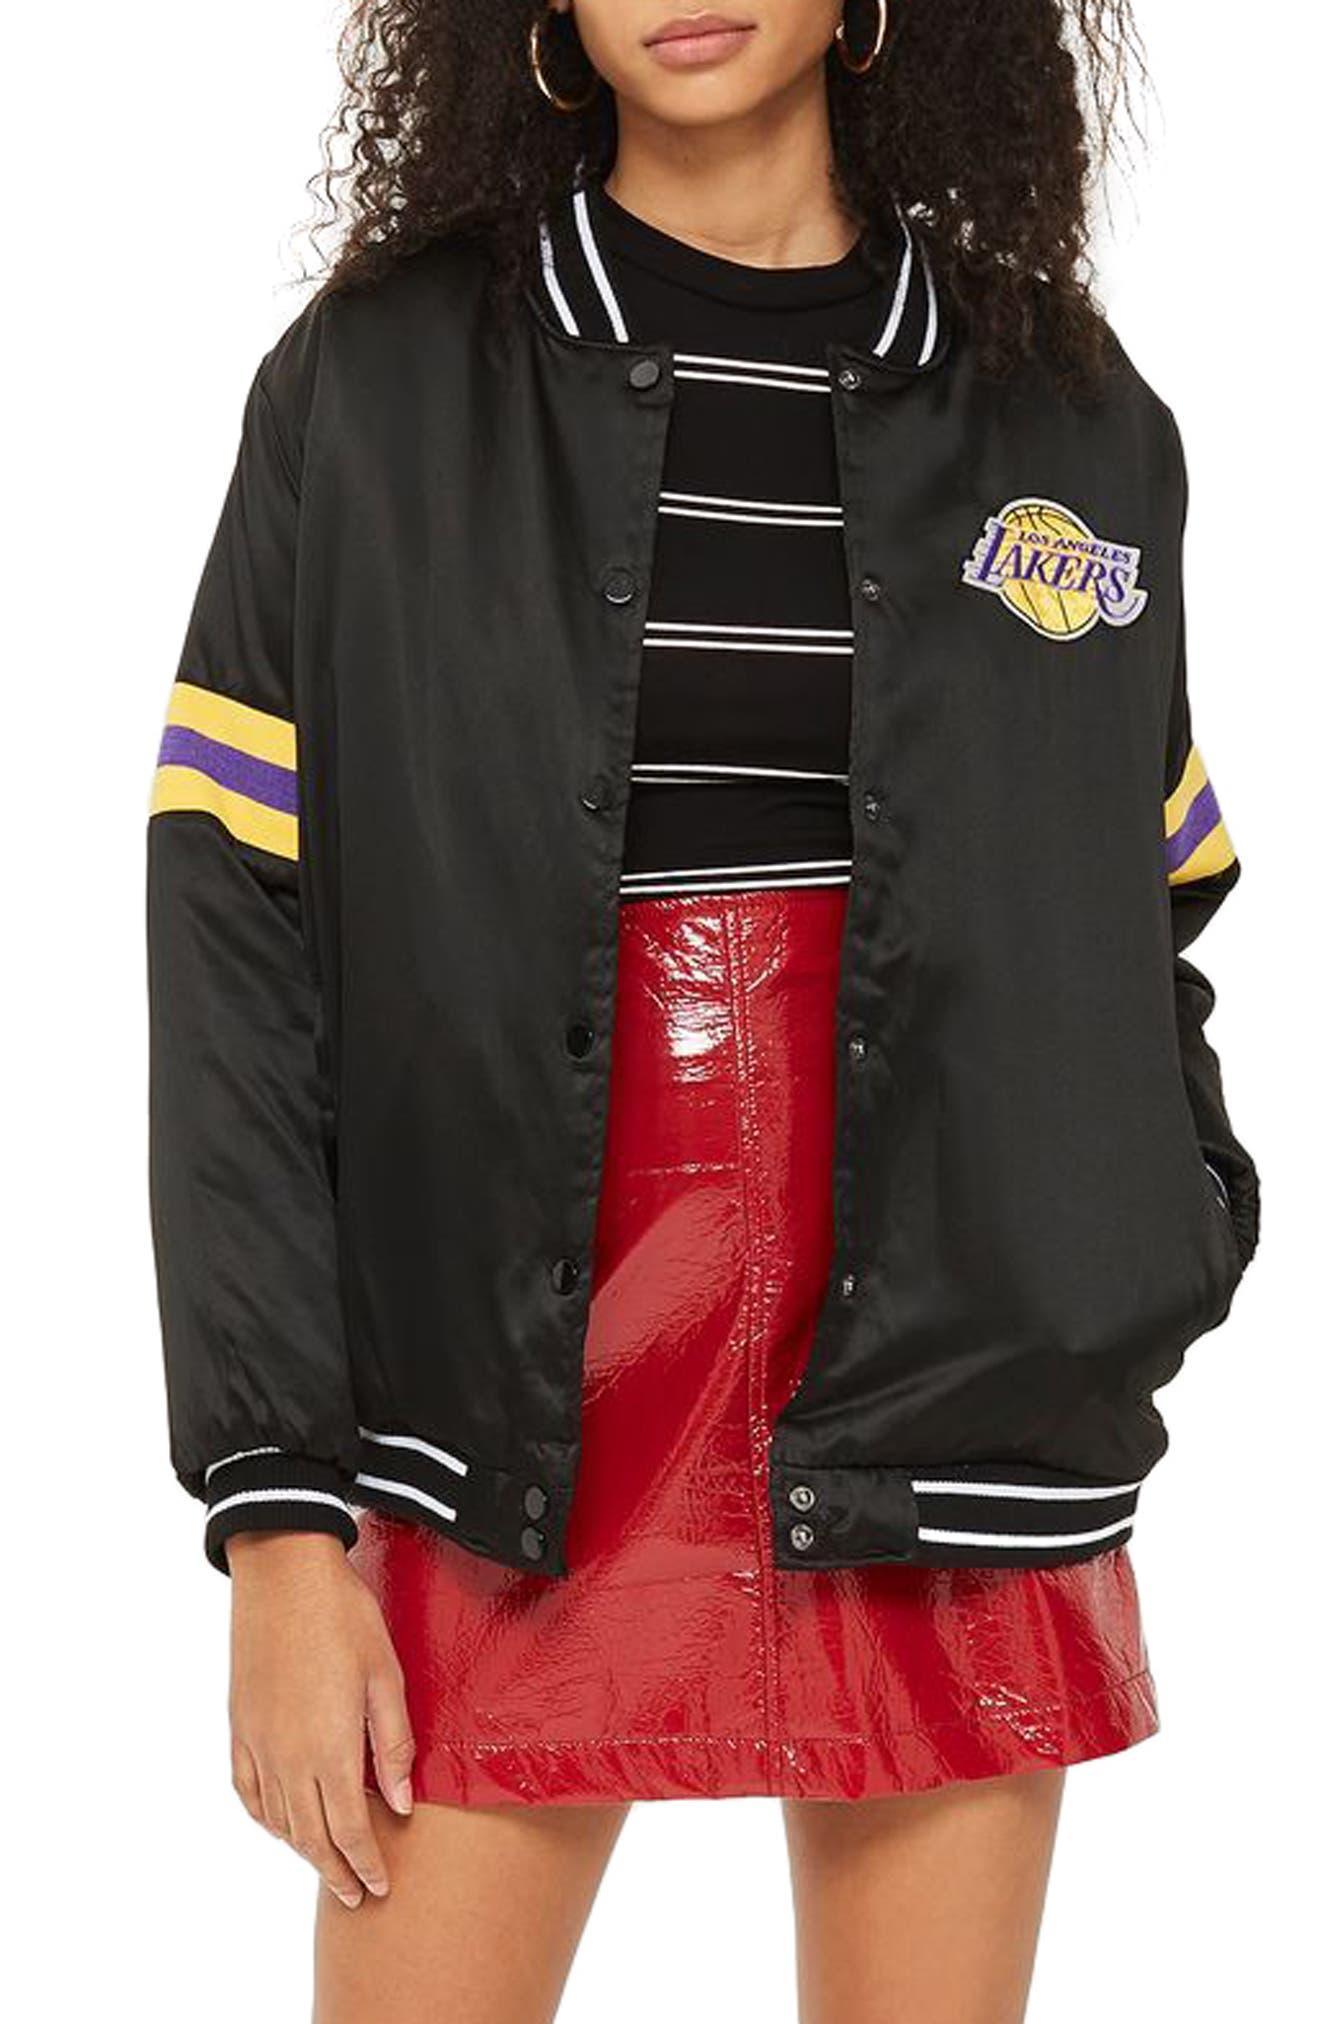 x UNK Lakers Bomber Jacket,                             Main thumbnail 1, color,                             001